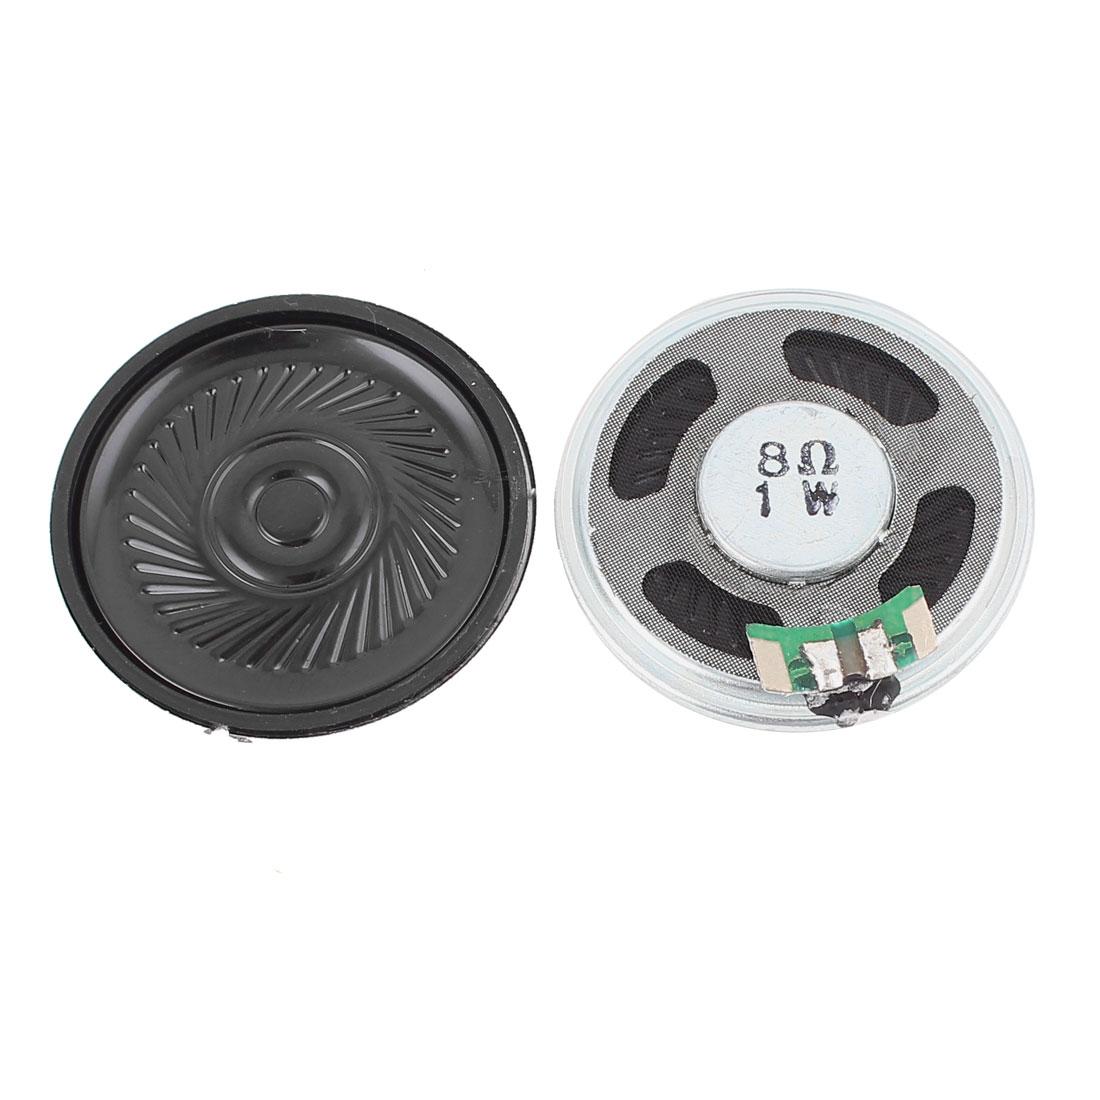 2 Pcs 0.1W 8 Ohm 40mm Round Inside Magnet Electronic Speaker Loudspeaker